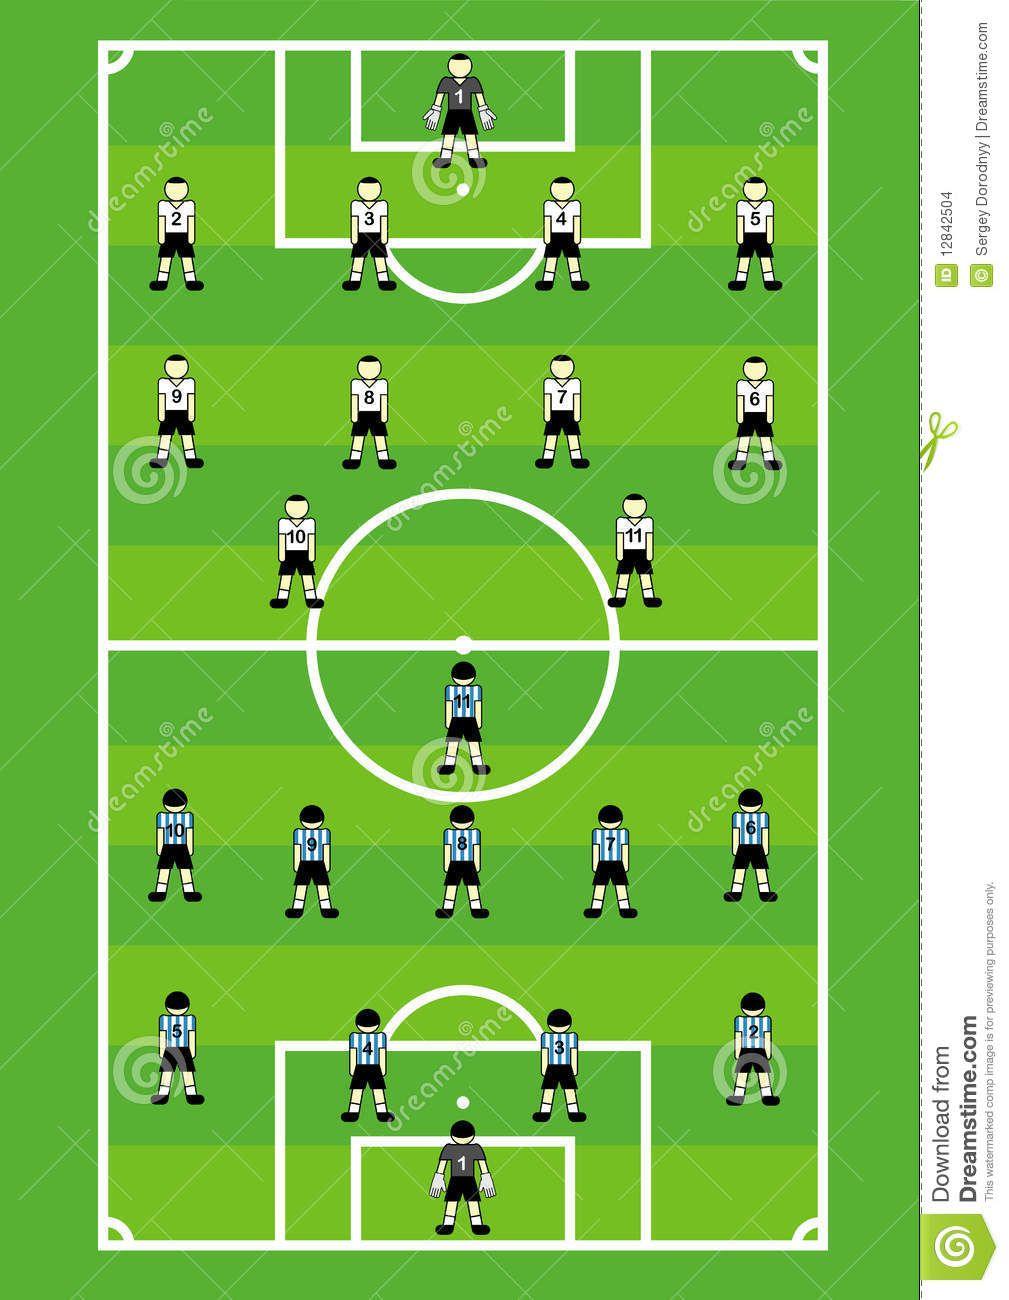 Backyard Soccer Mls Edition Free Download - BACKYARD HOME